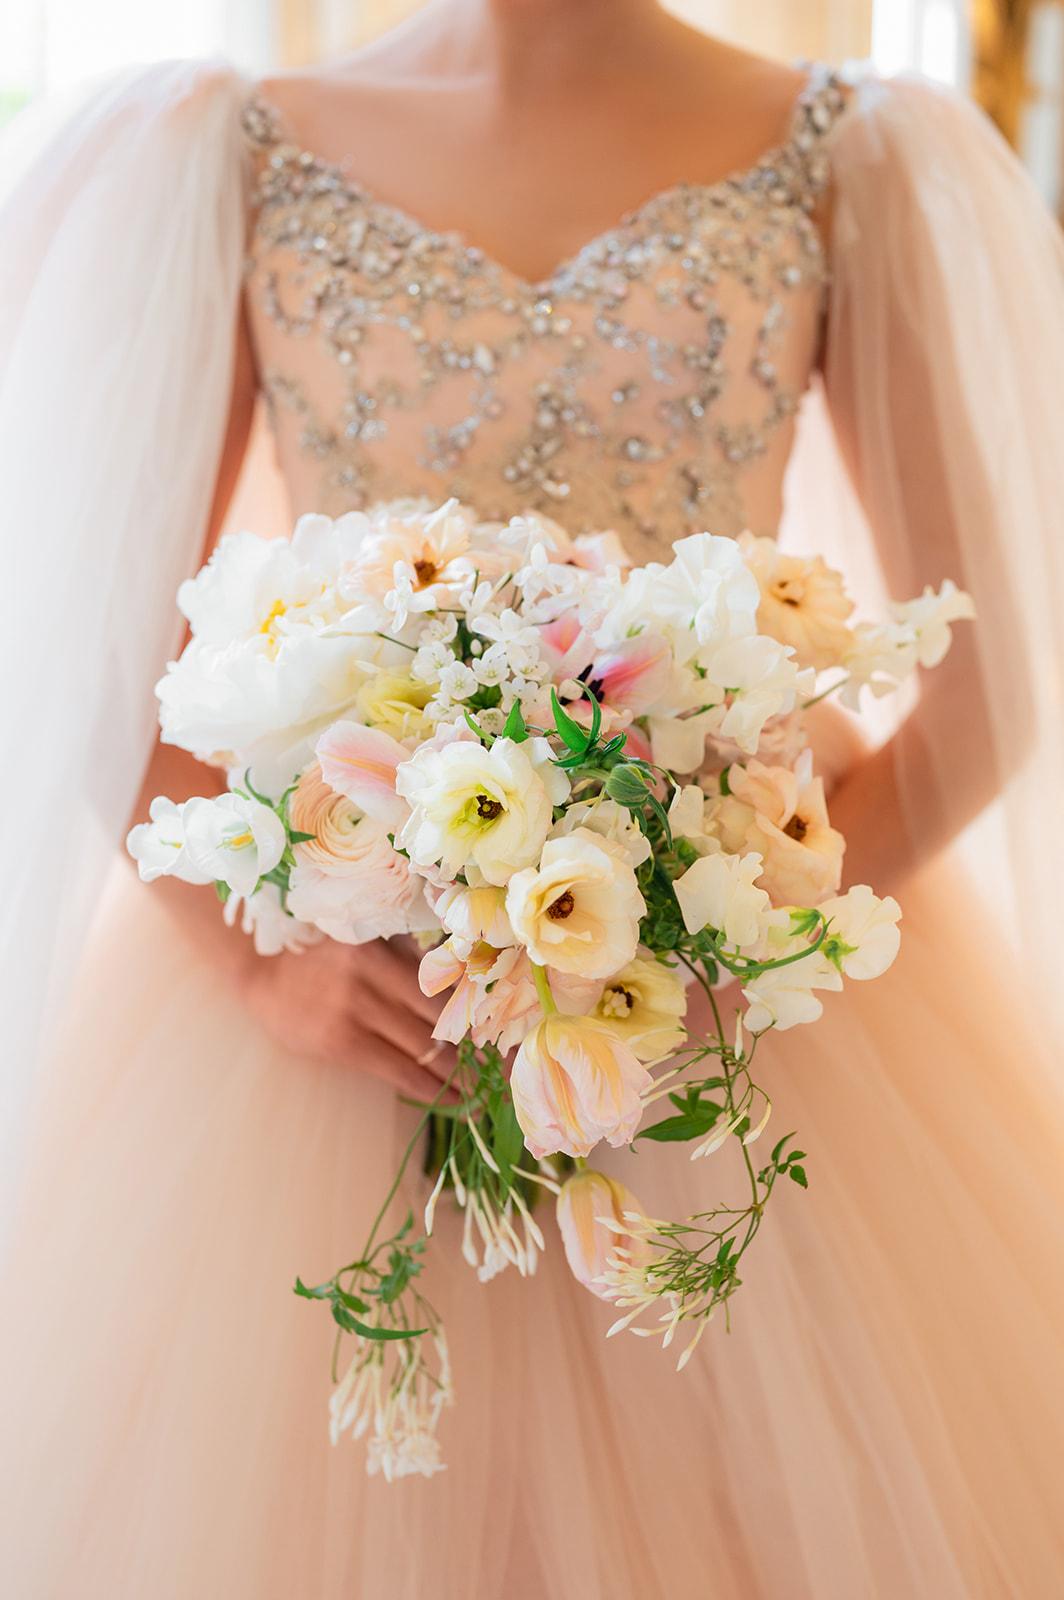 Villa Balbiano luxury destination wedding, featuring a bride holding blush and neutral fine art bouquet